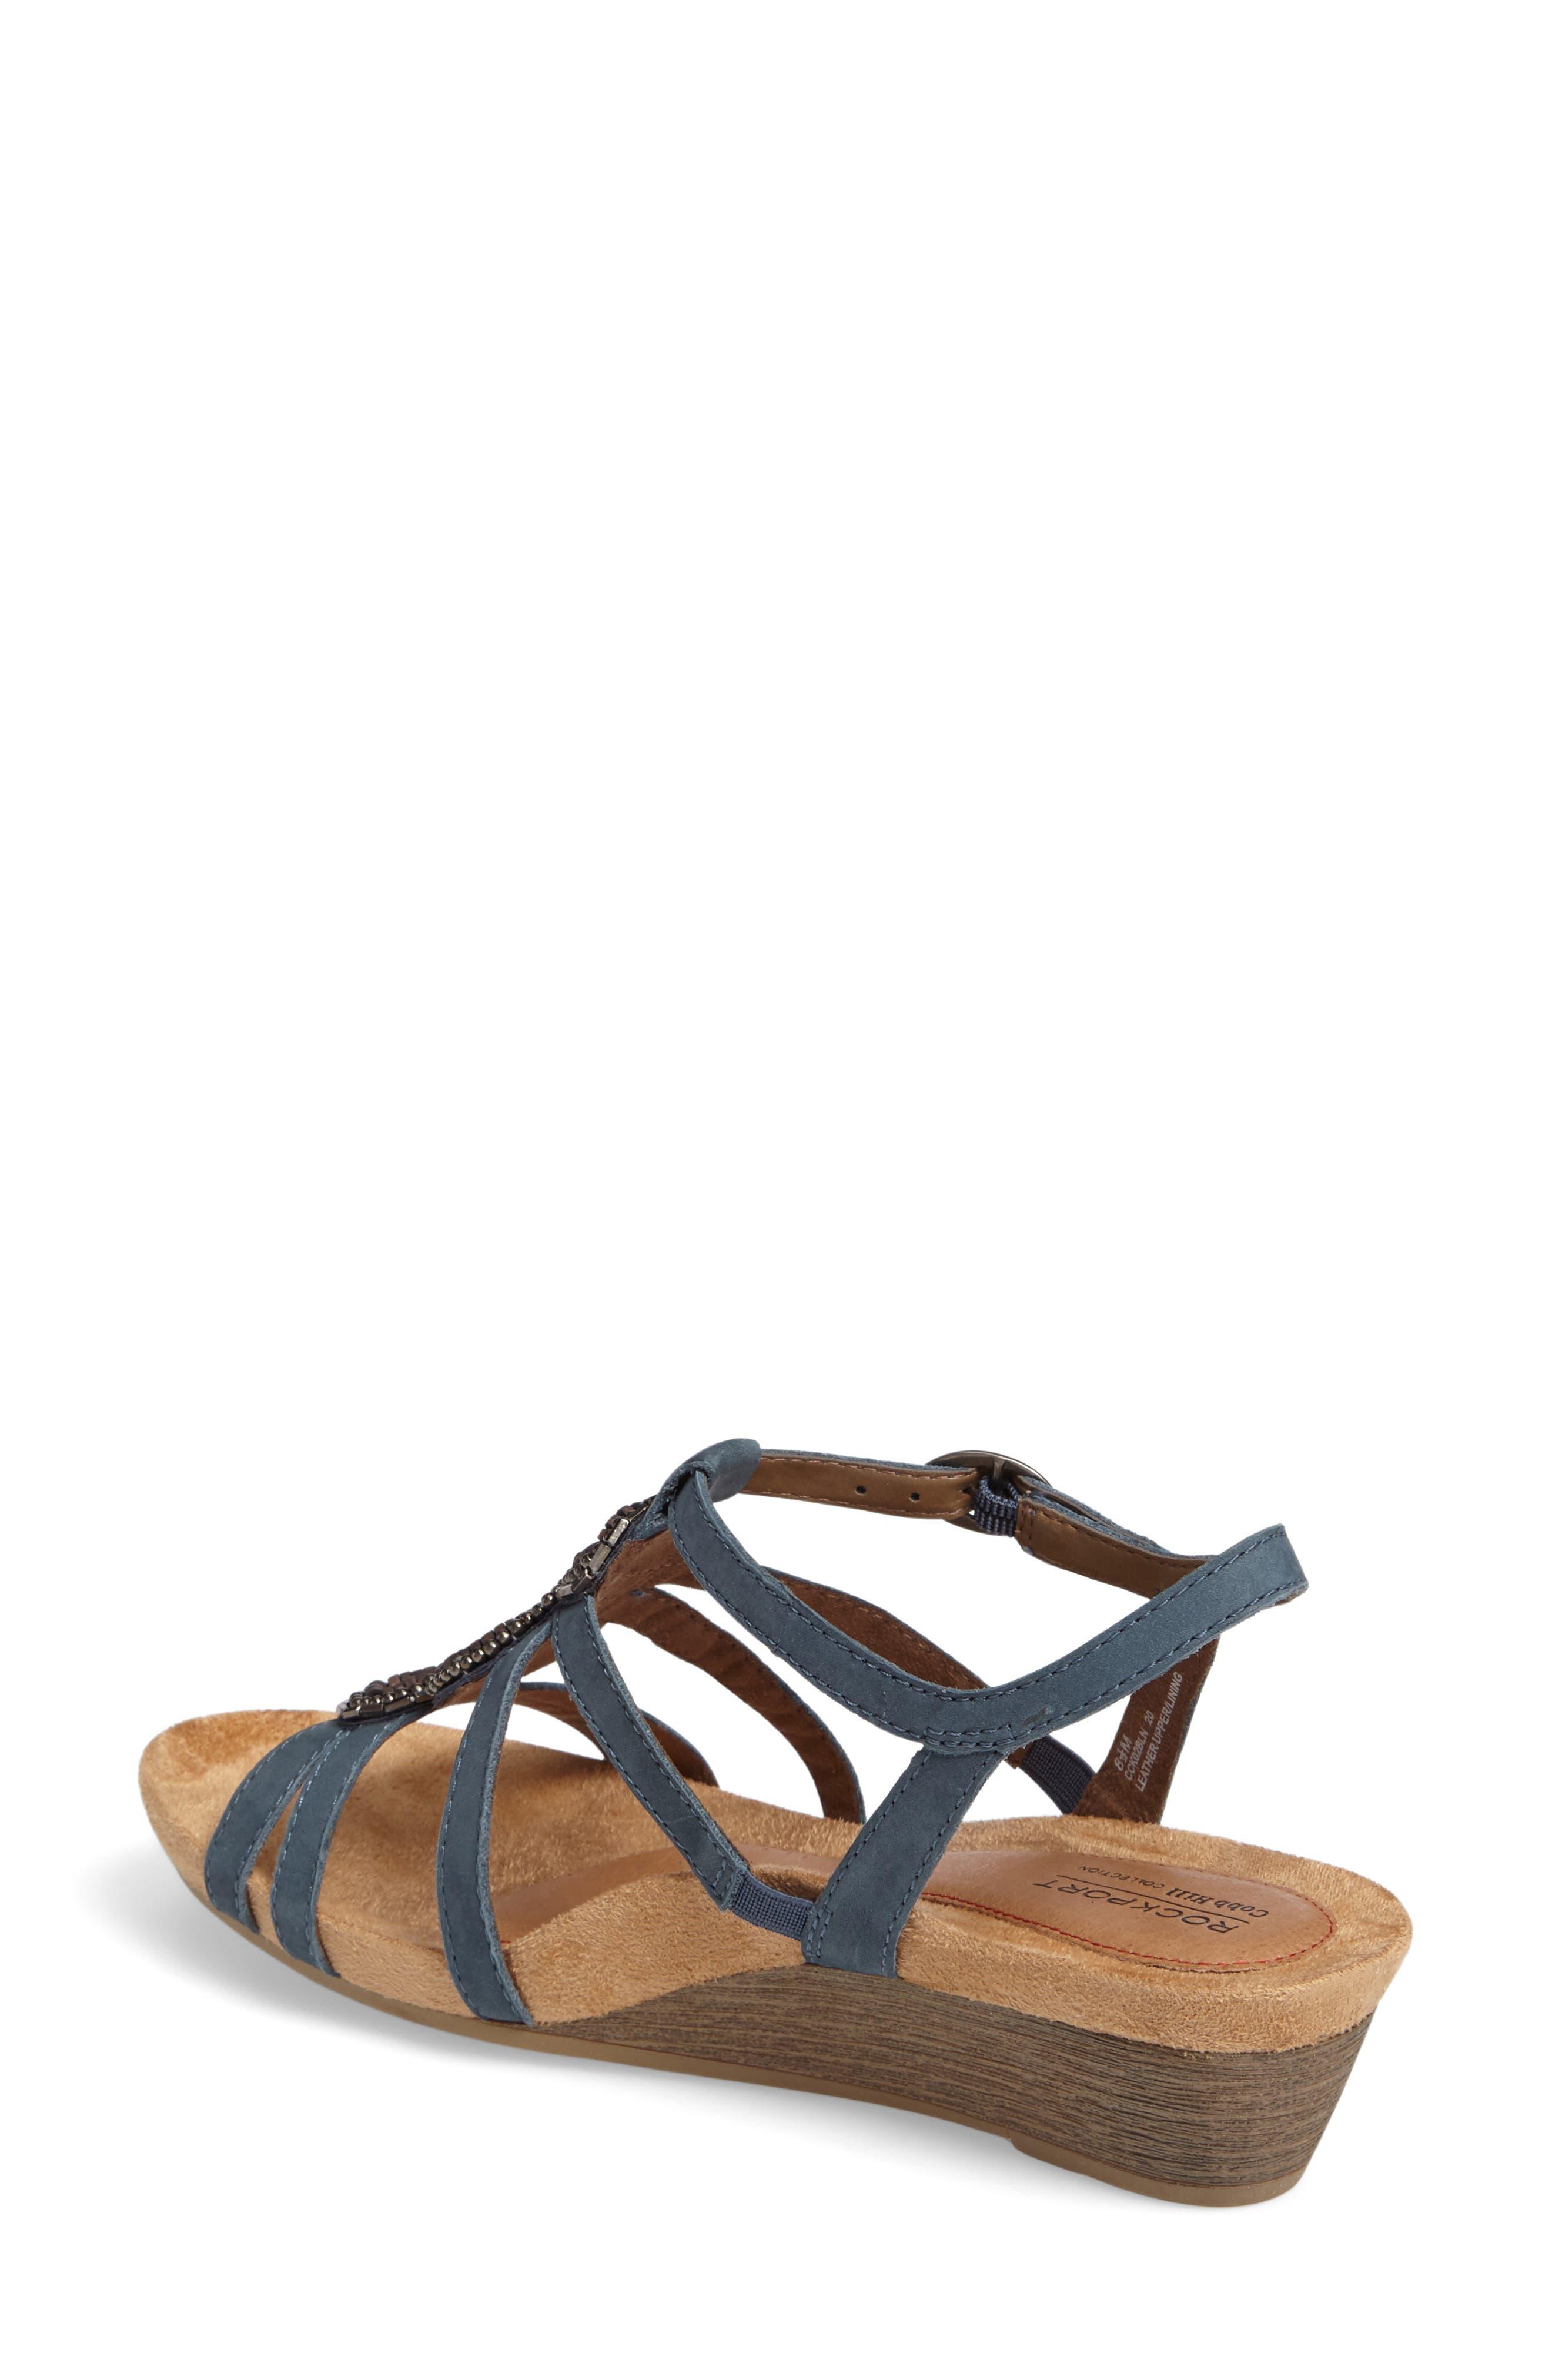 'Hannah' Leather Sandal,                             Alternate thumbnail 2, color,                             BLUE NUBUCK